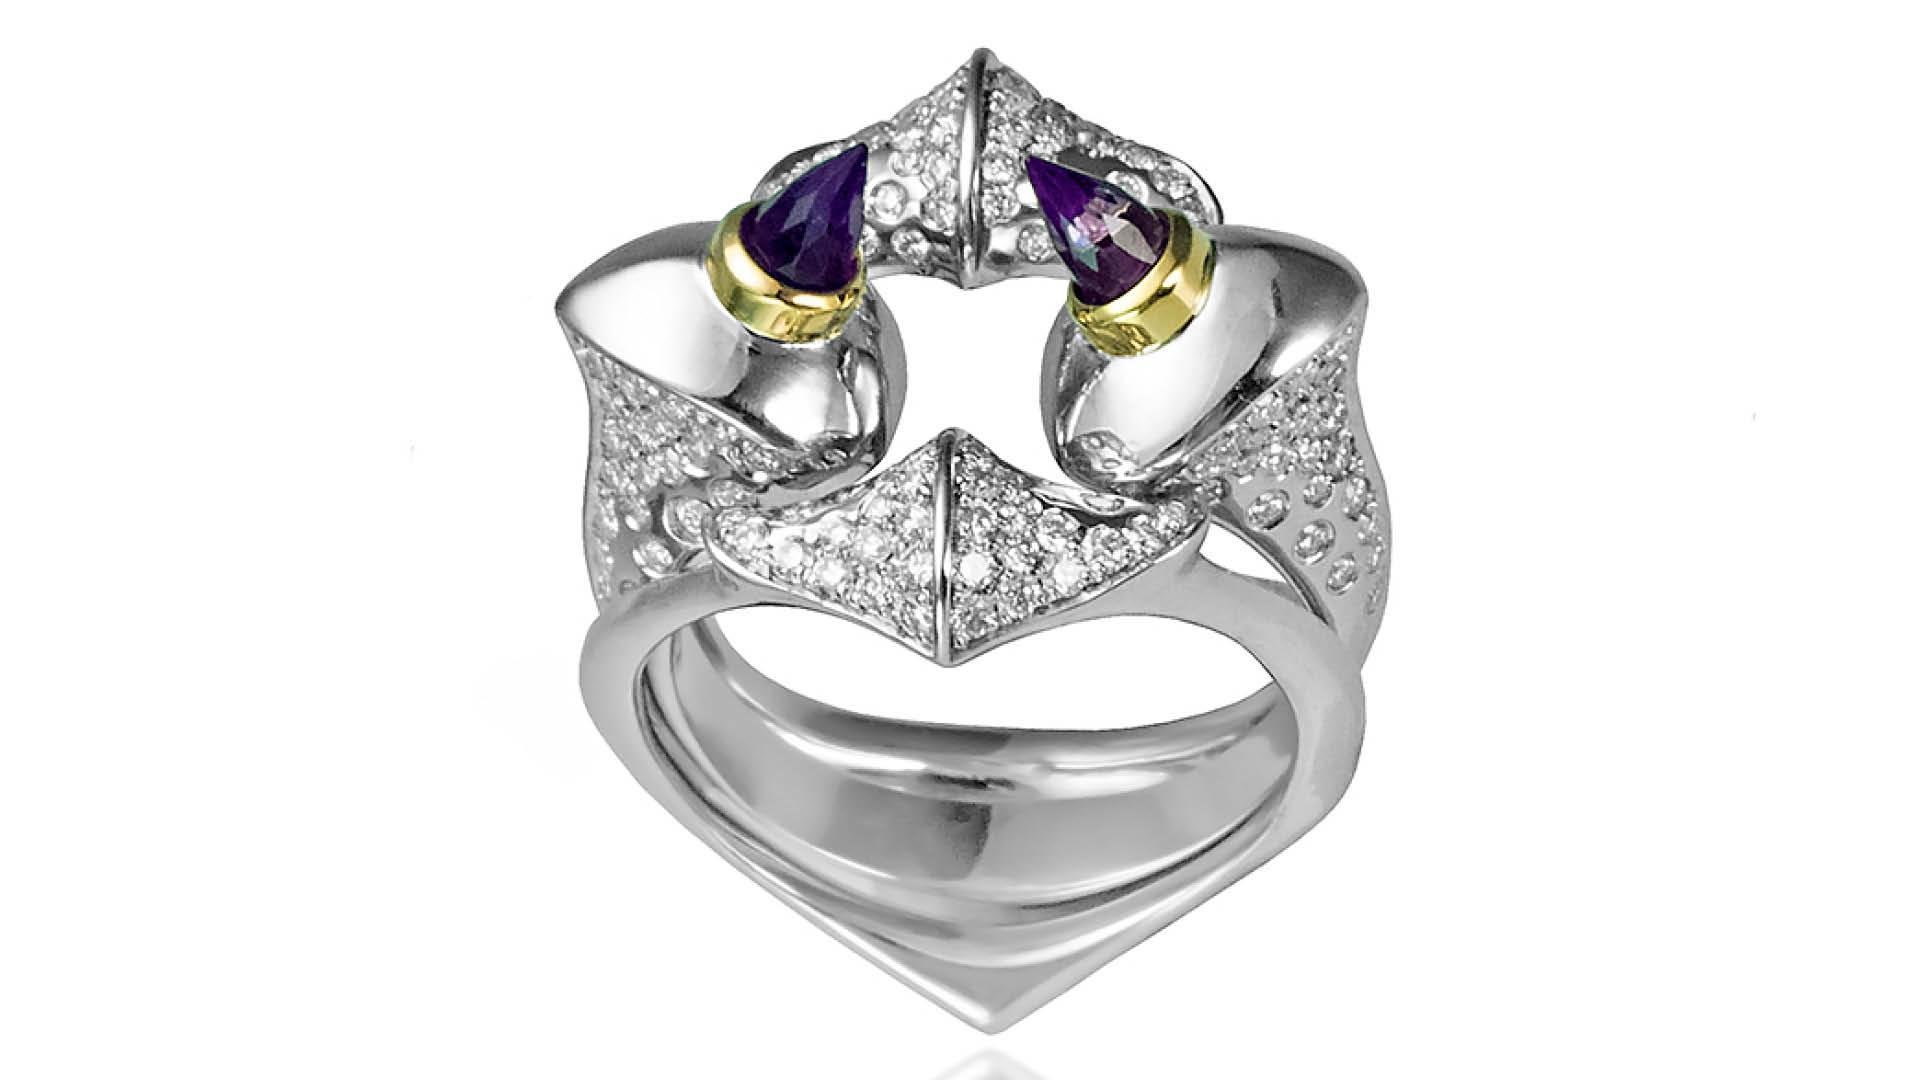 Lilith Interlocking Diamond Amethyst Ring